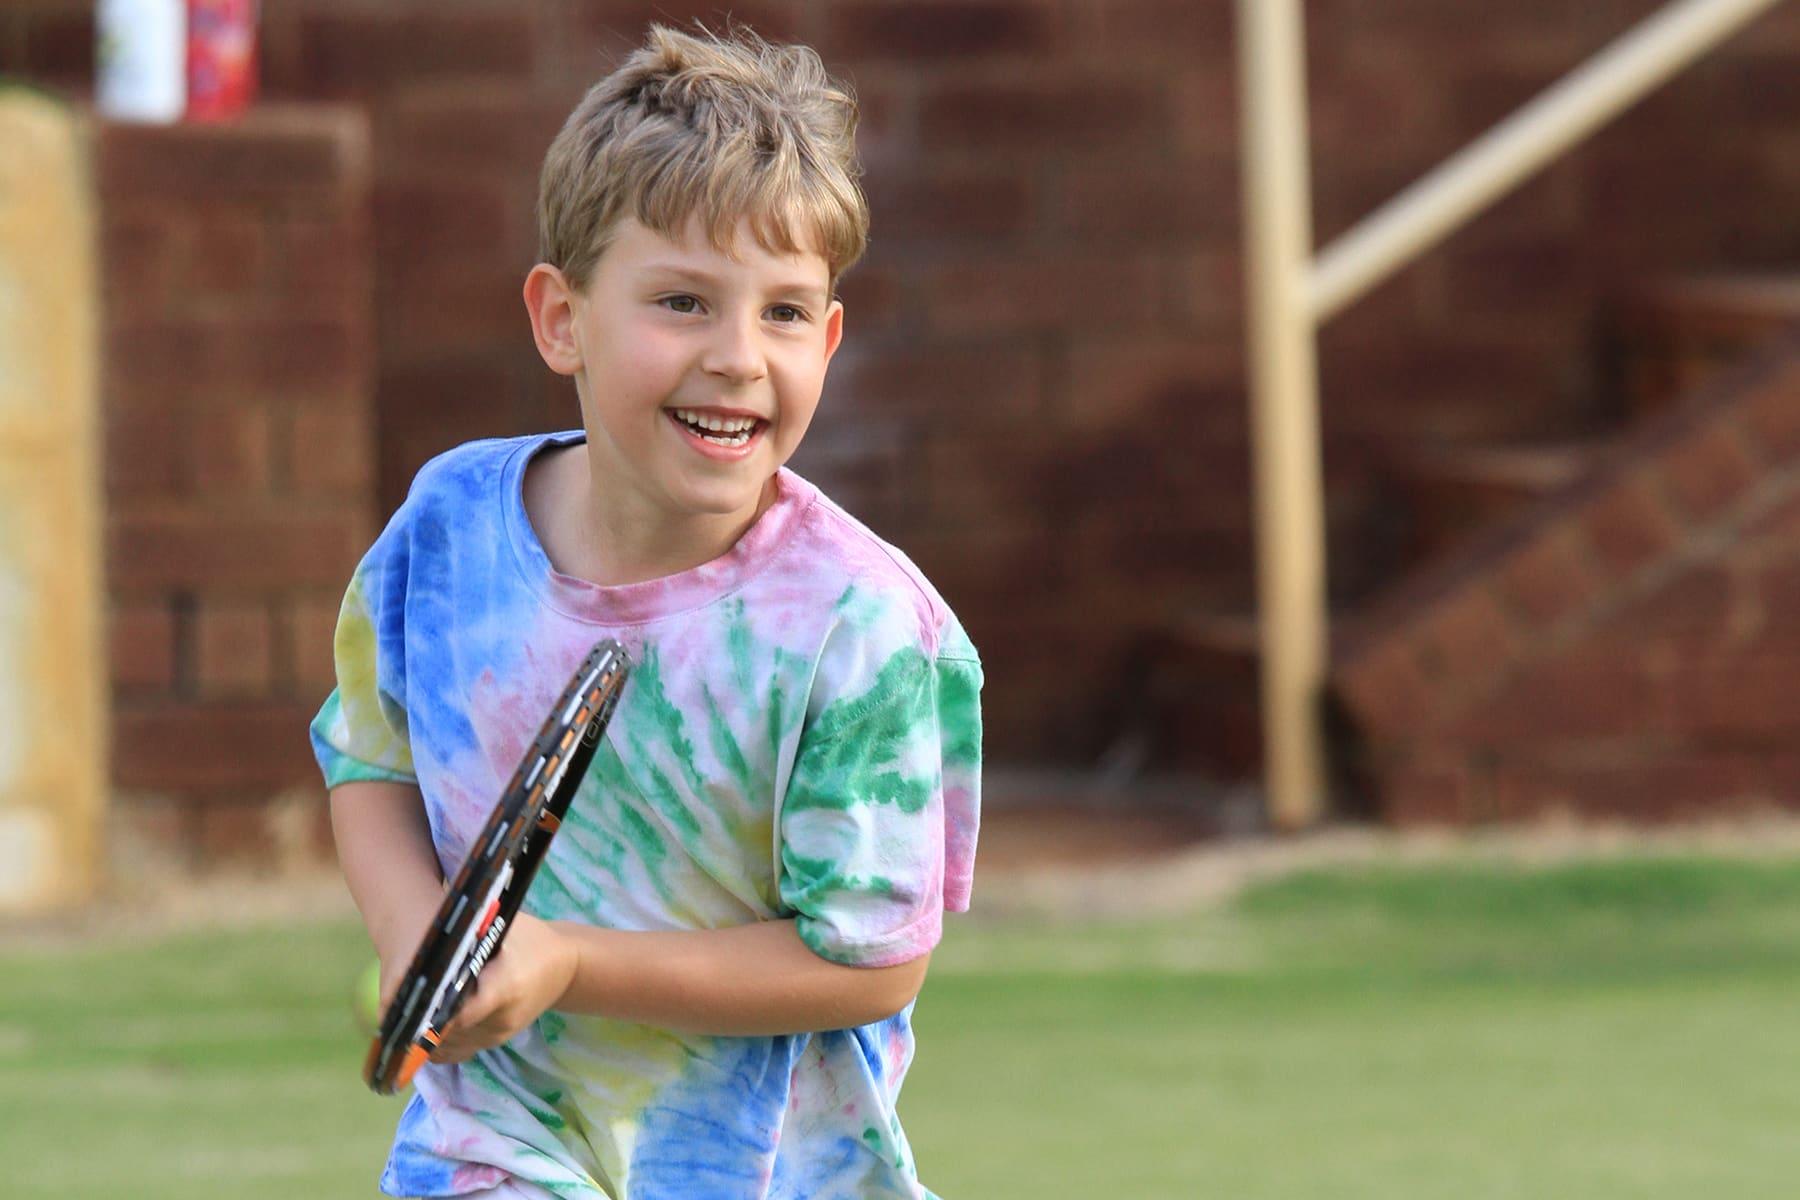 https://www.tennisexcellence.com.au/wp-content/uploads/2020/01/Home_Programs_Hotshots.jpg